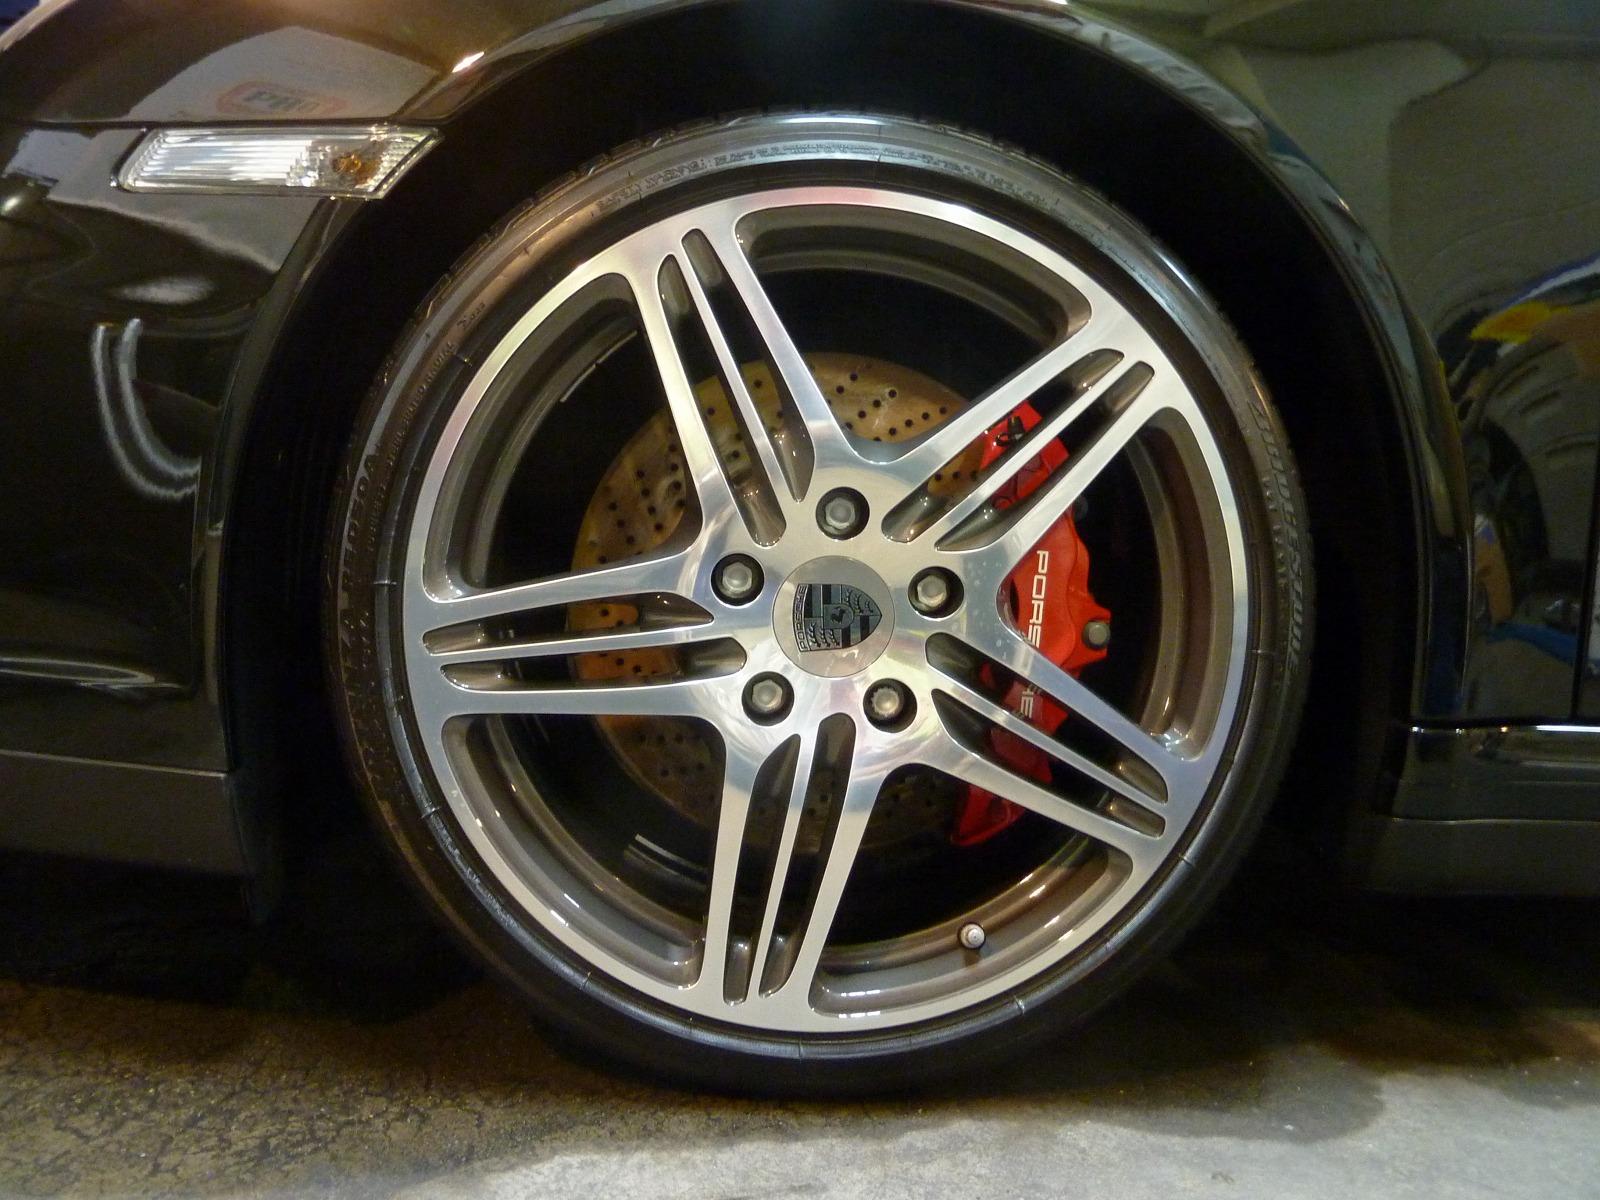 20140529-porsche-911-turbo-08